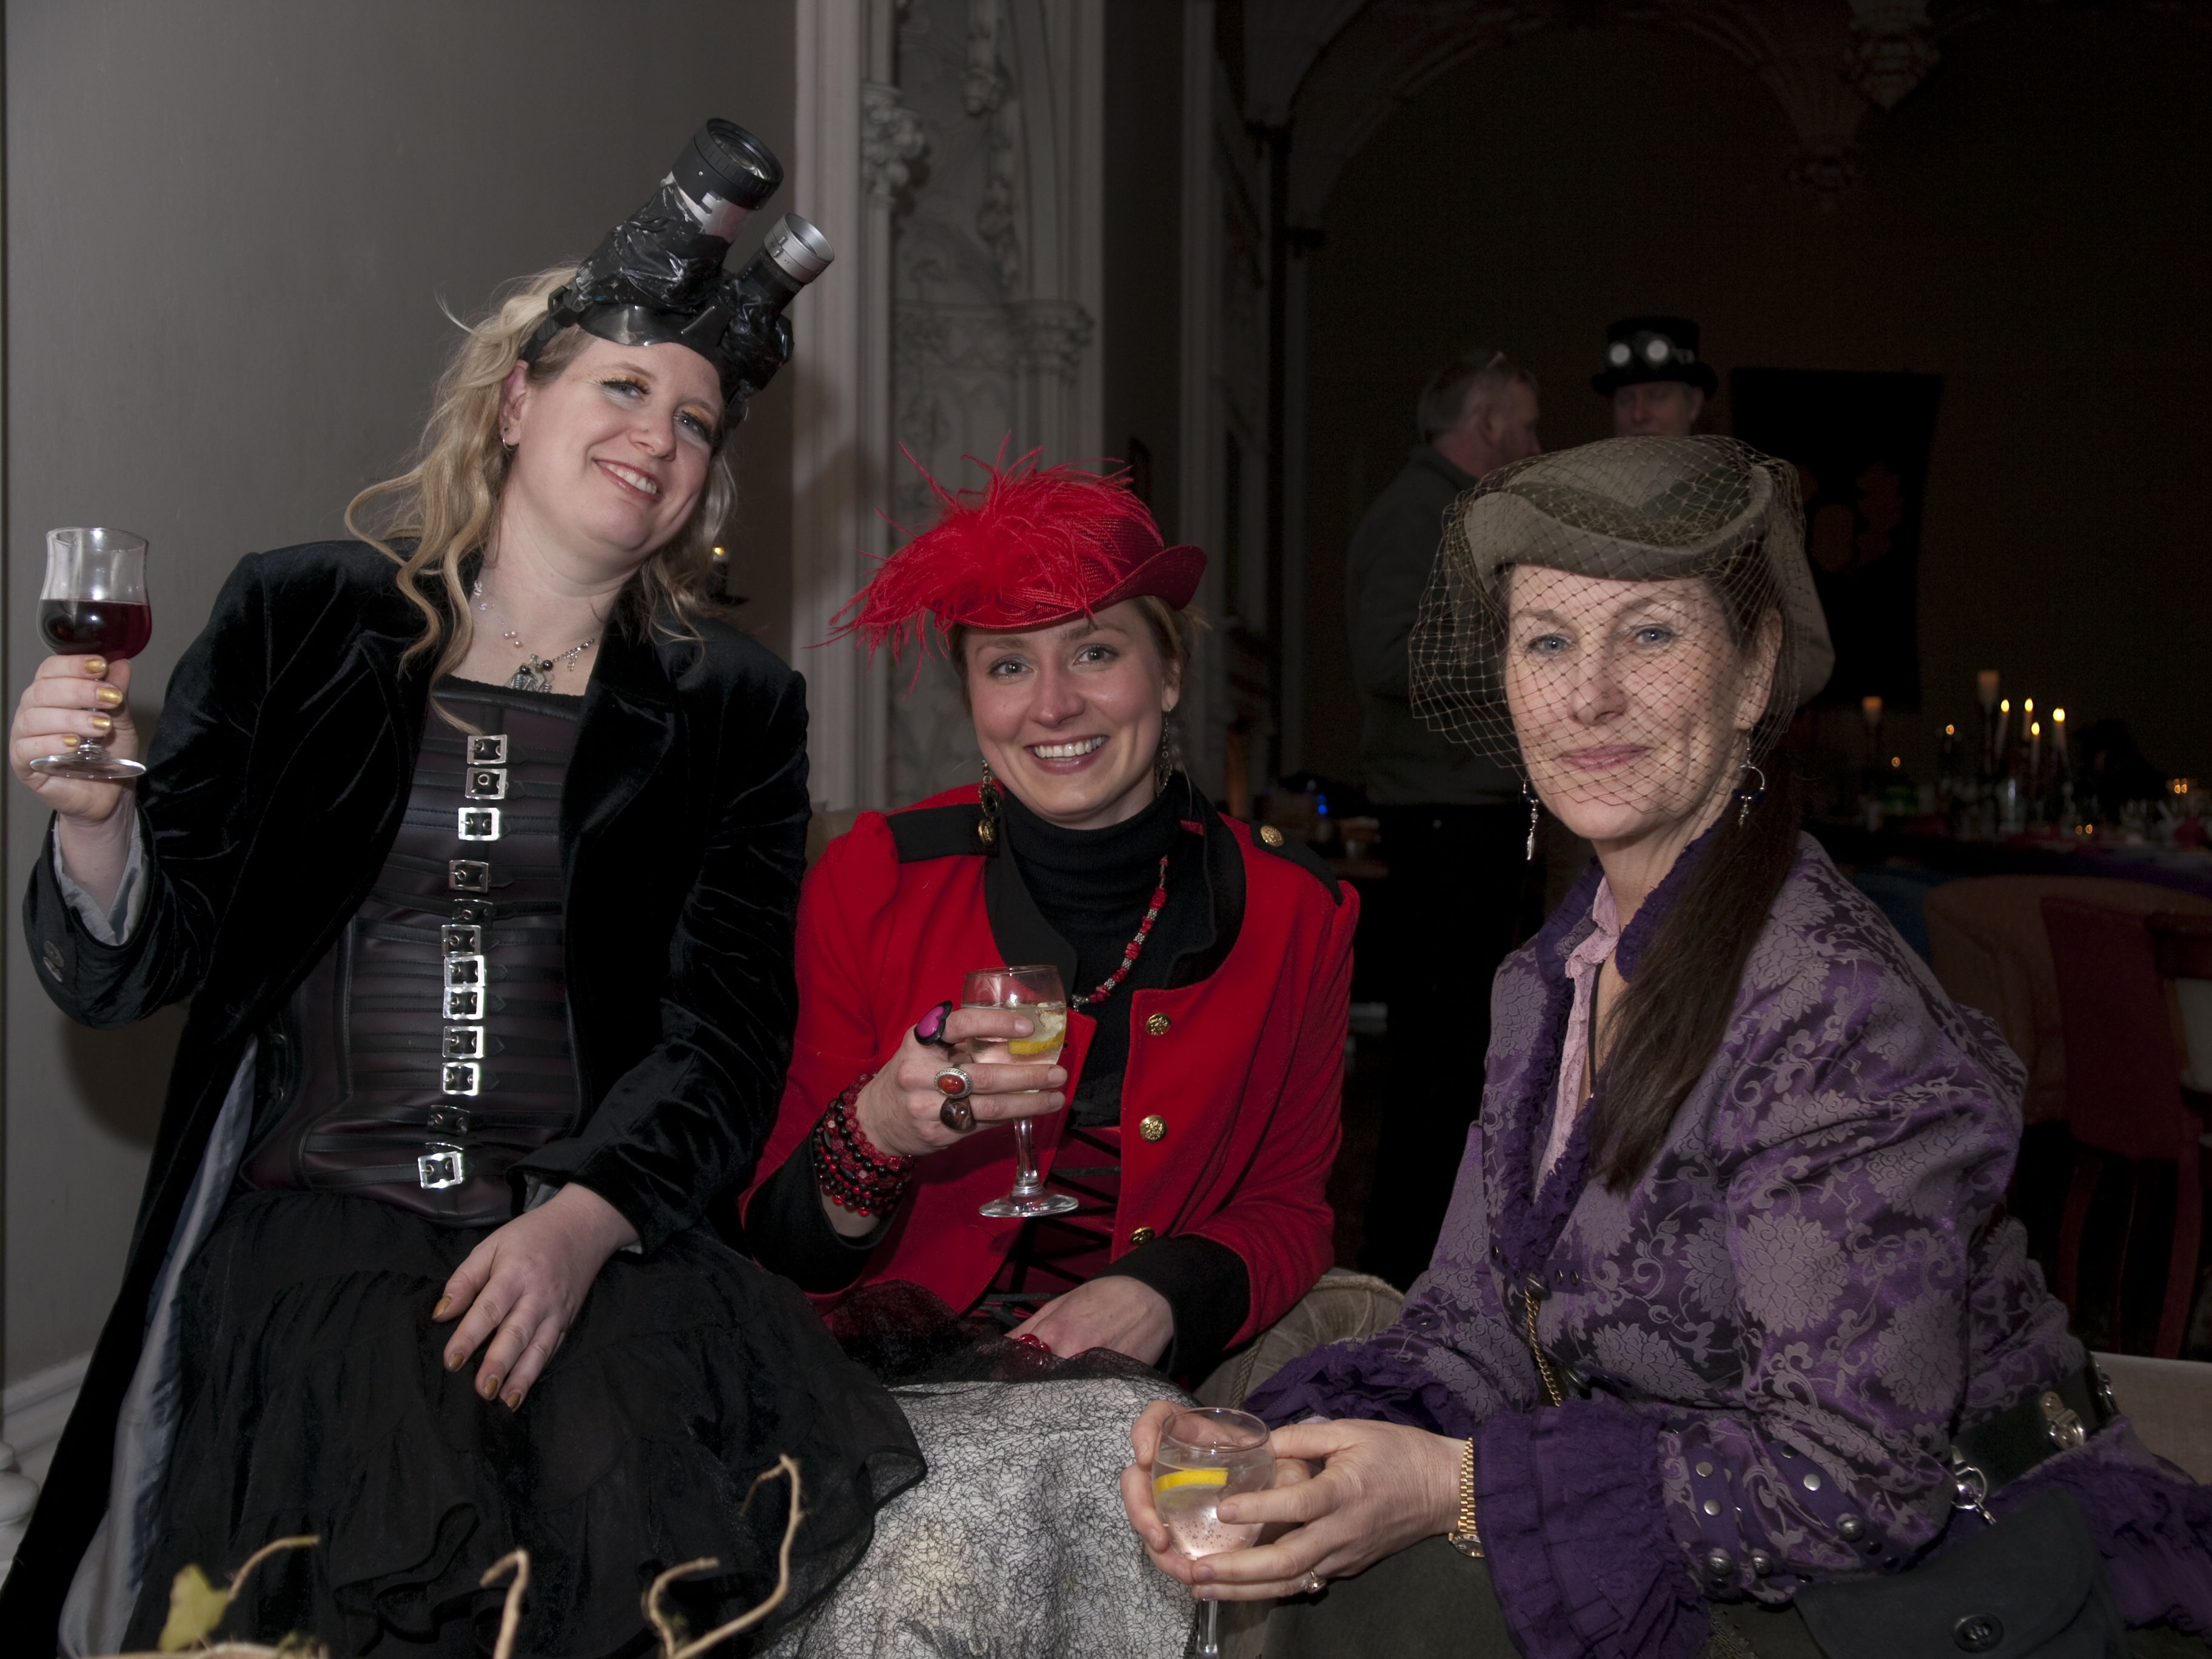 Victorian Steampunk Potluck, Groupshot, Indoor, People, HQ Photo